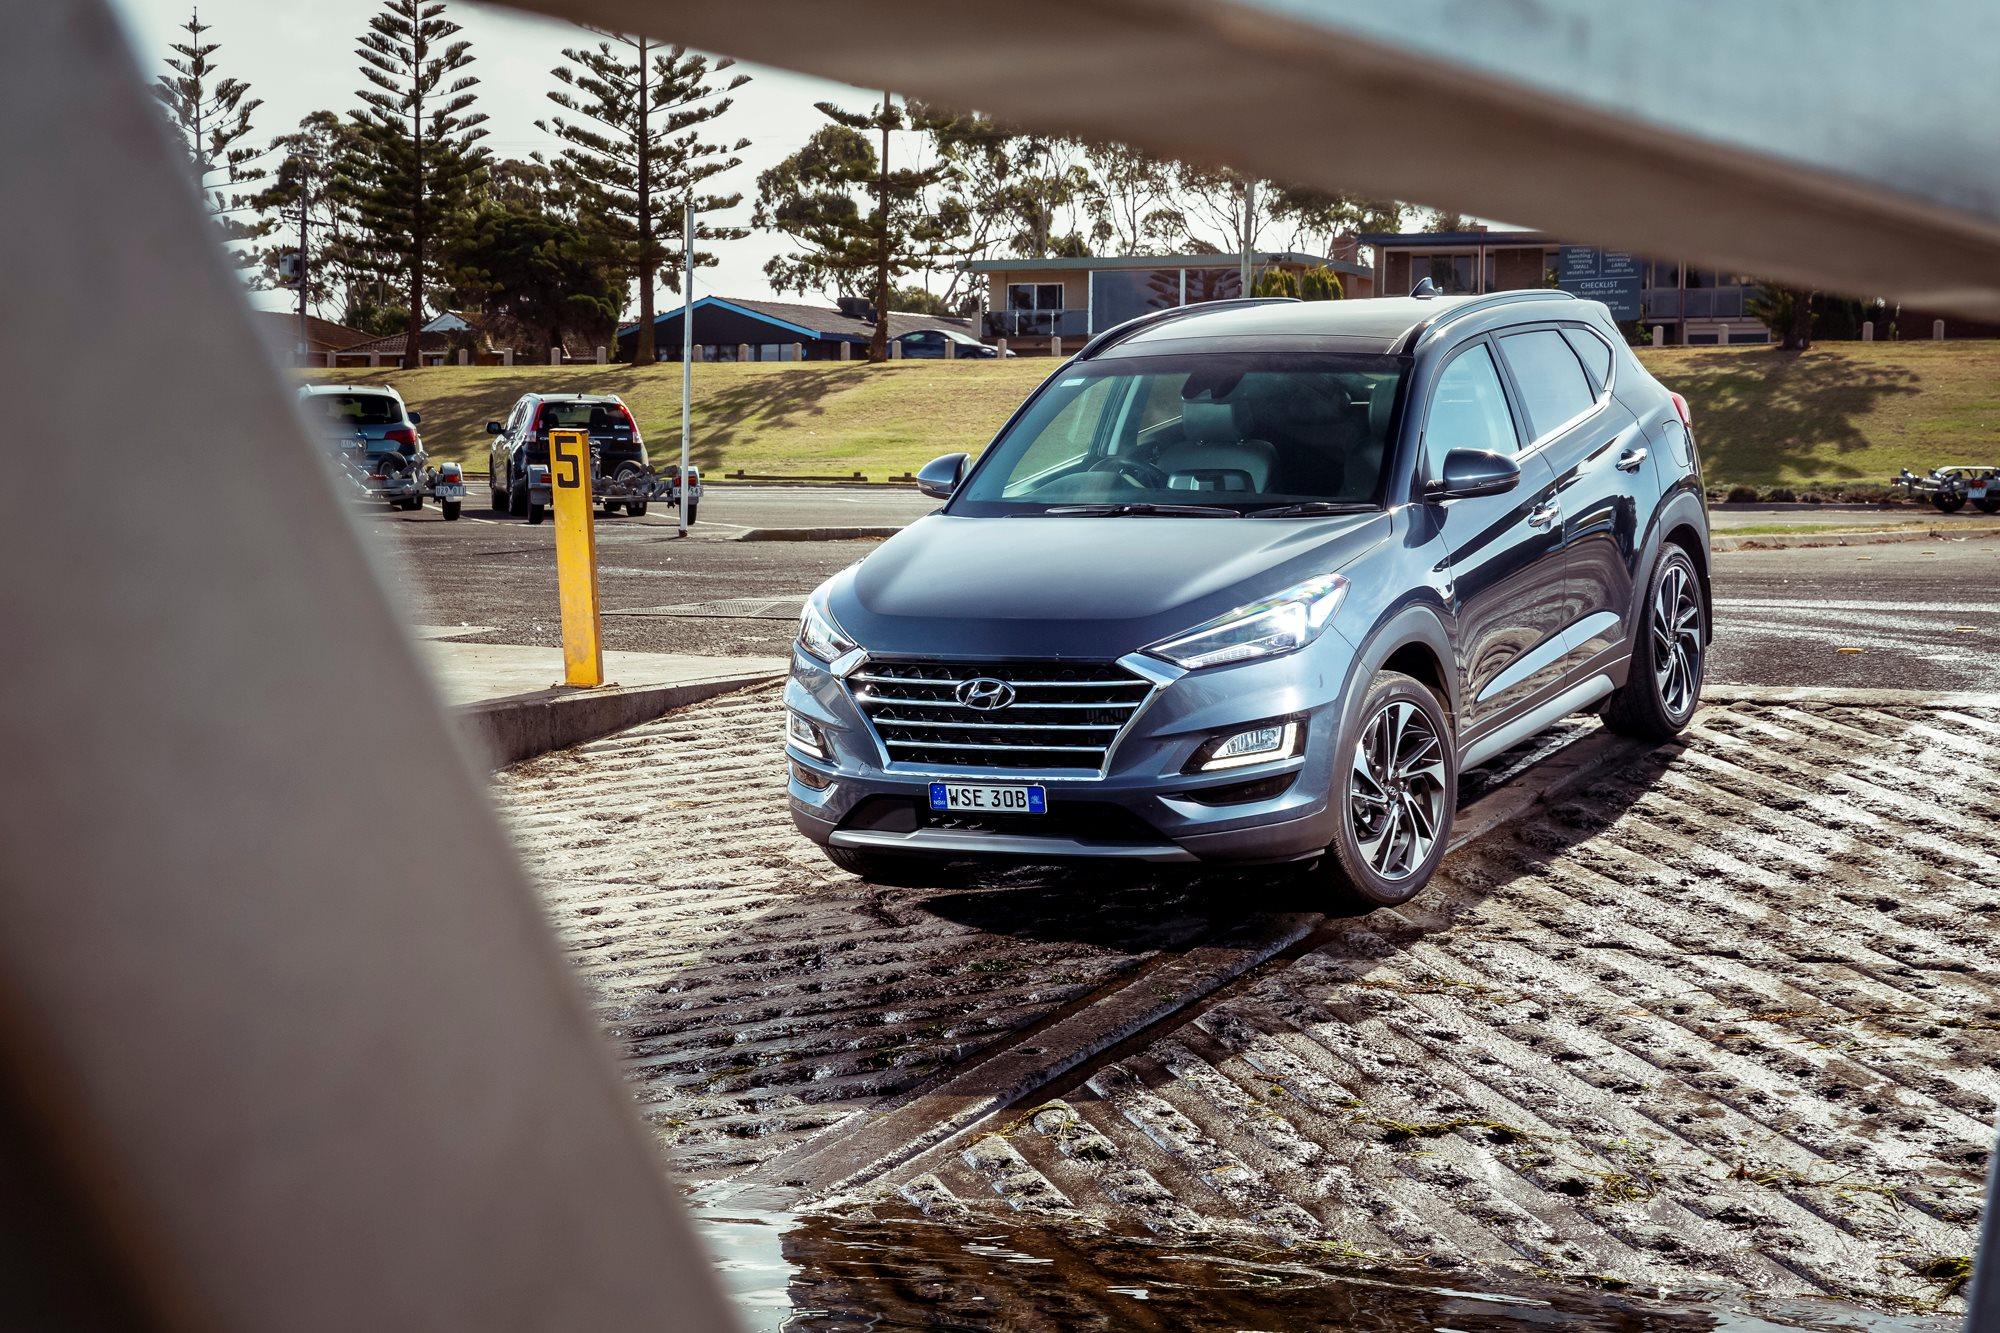 2019 mid-size SUV comparison test